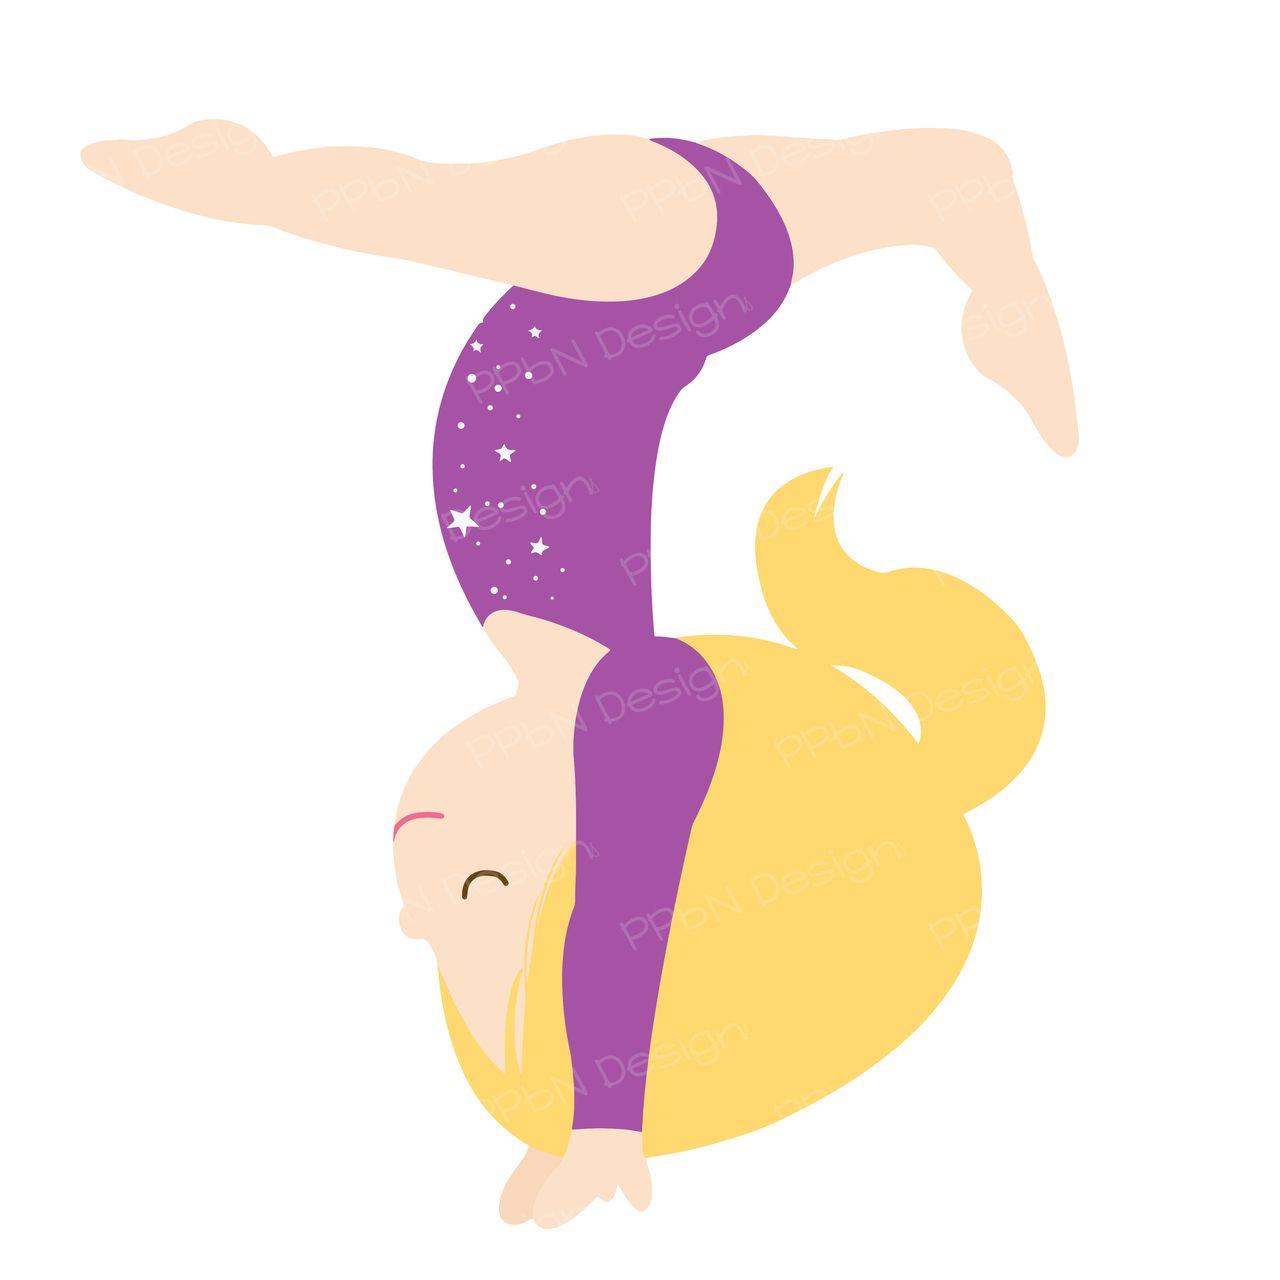 1280x1280 Bailarina Ballerine Handstand, Gymnasts And Products